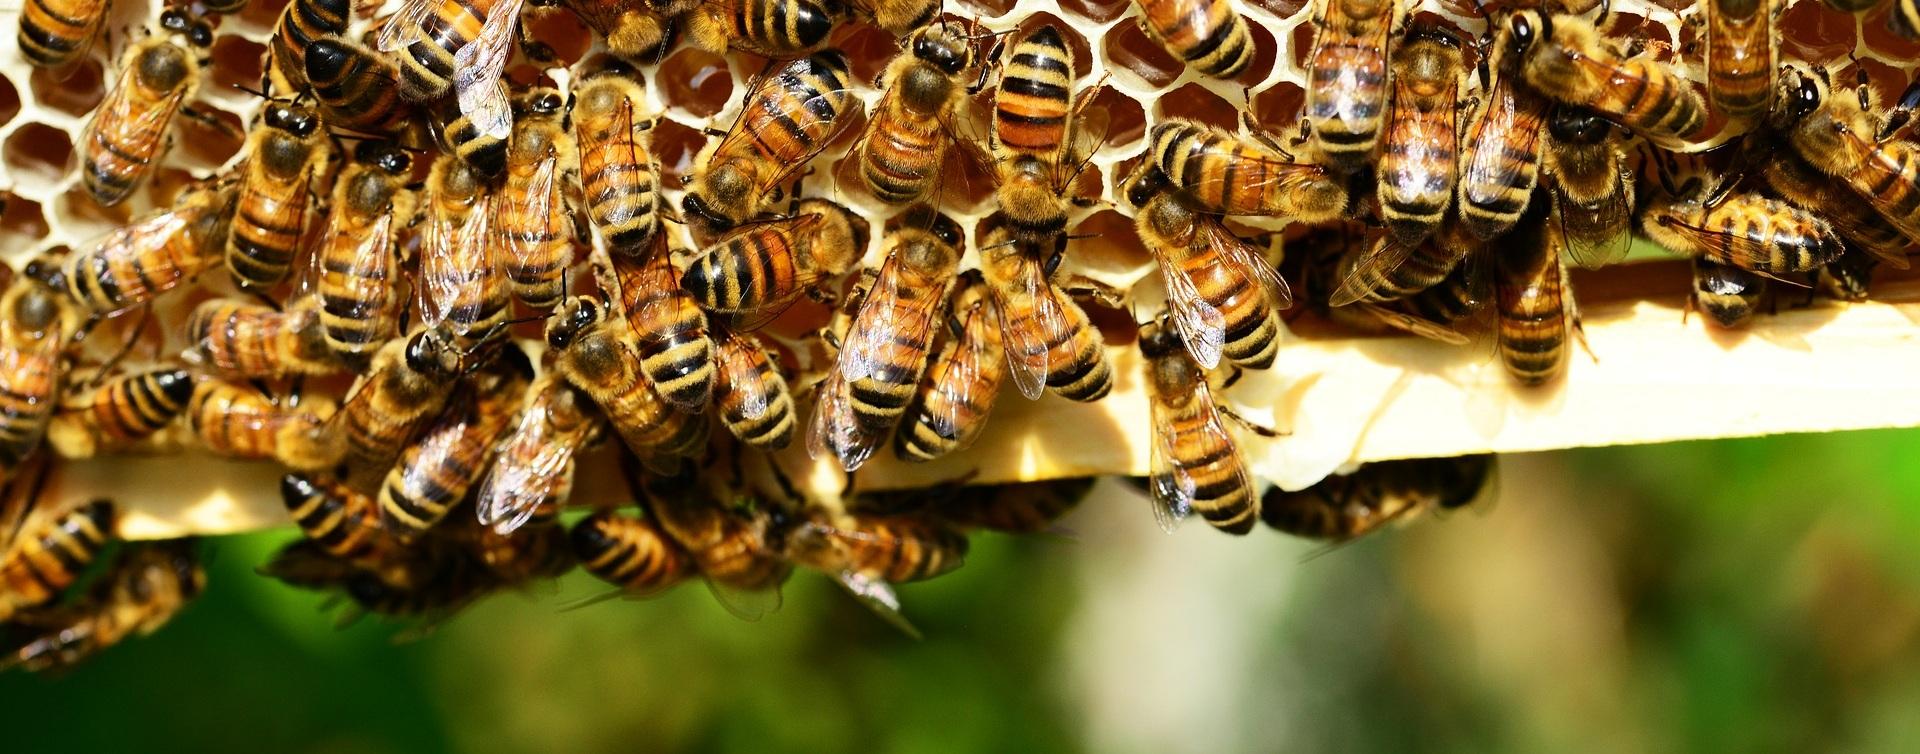 honey-bees-401238_1920.jpg